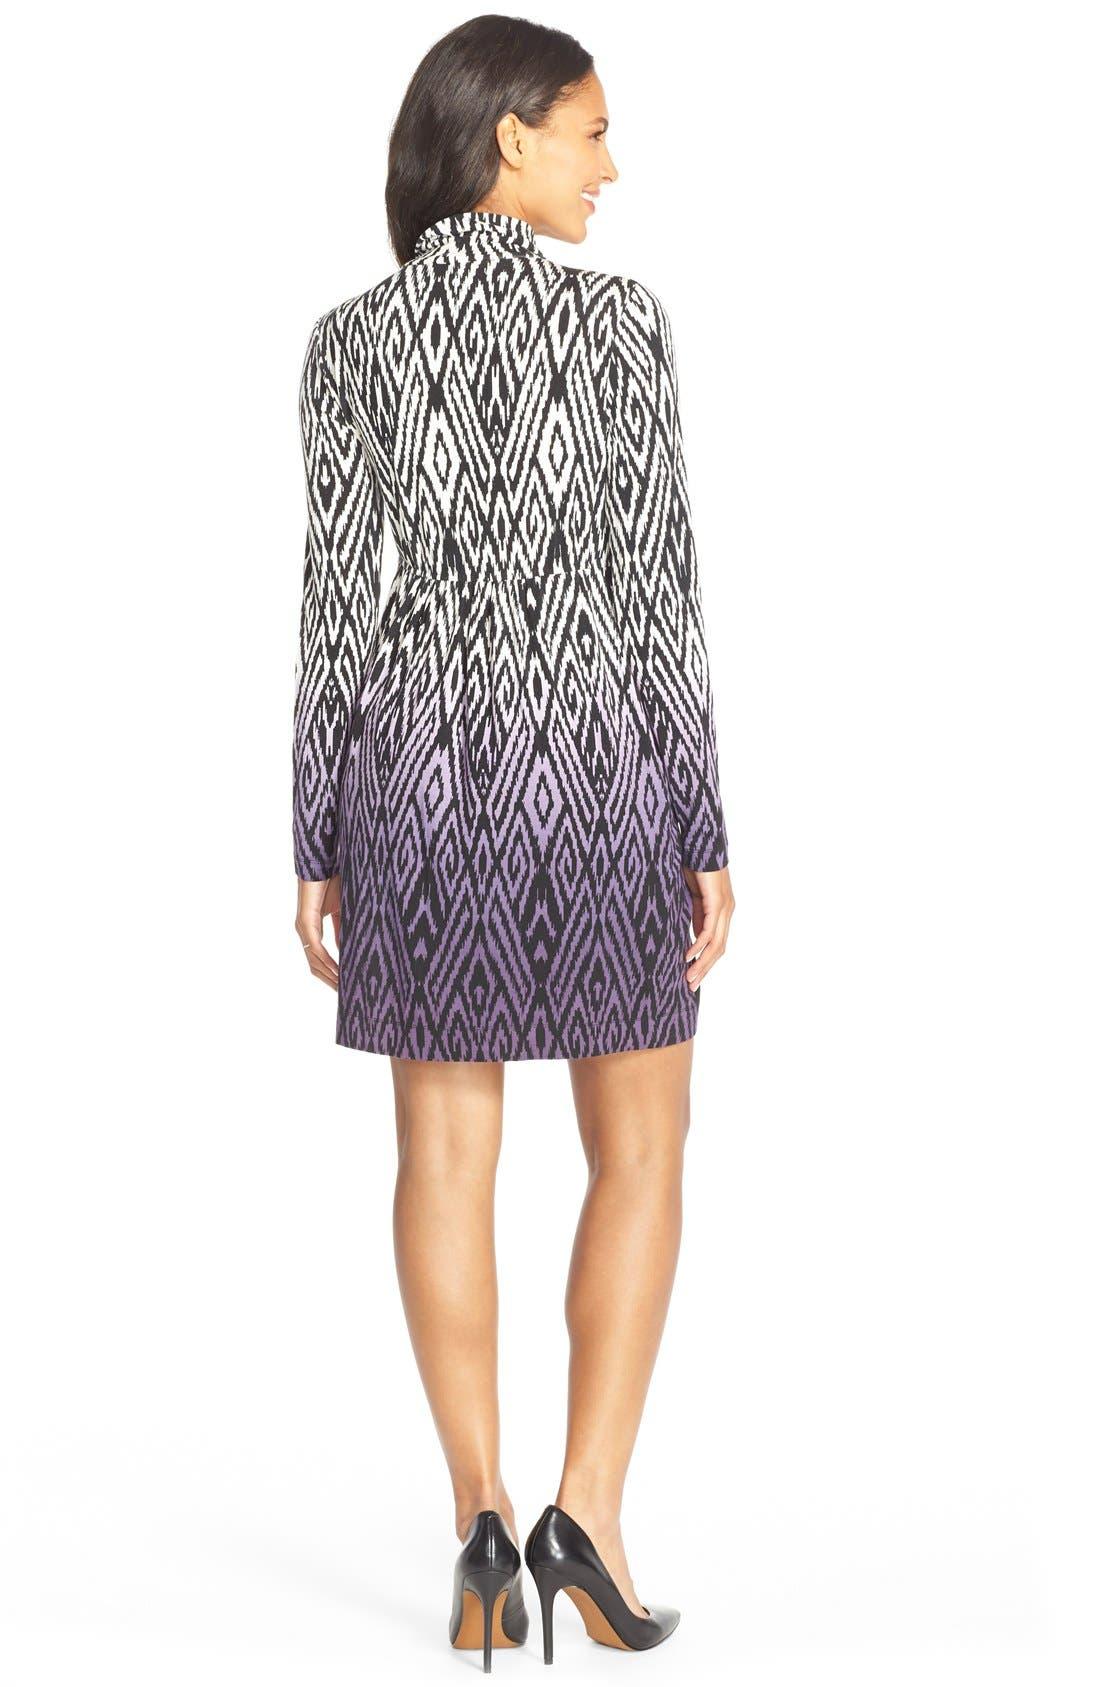 'Rhiannon' Turtleneck Fit & Flare Maternity Dress,                             Alternate thumbnail 2, color,                             Dip Dye Ikat